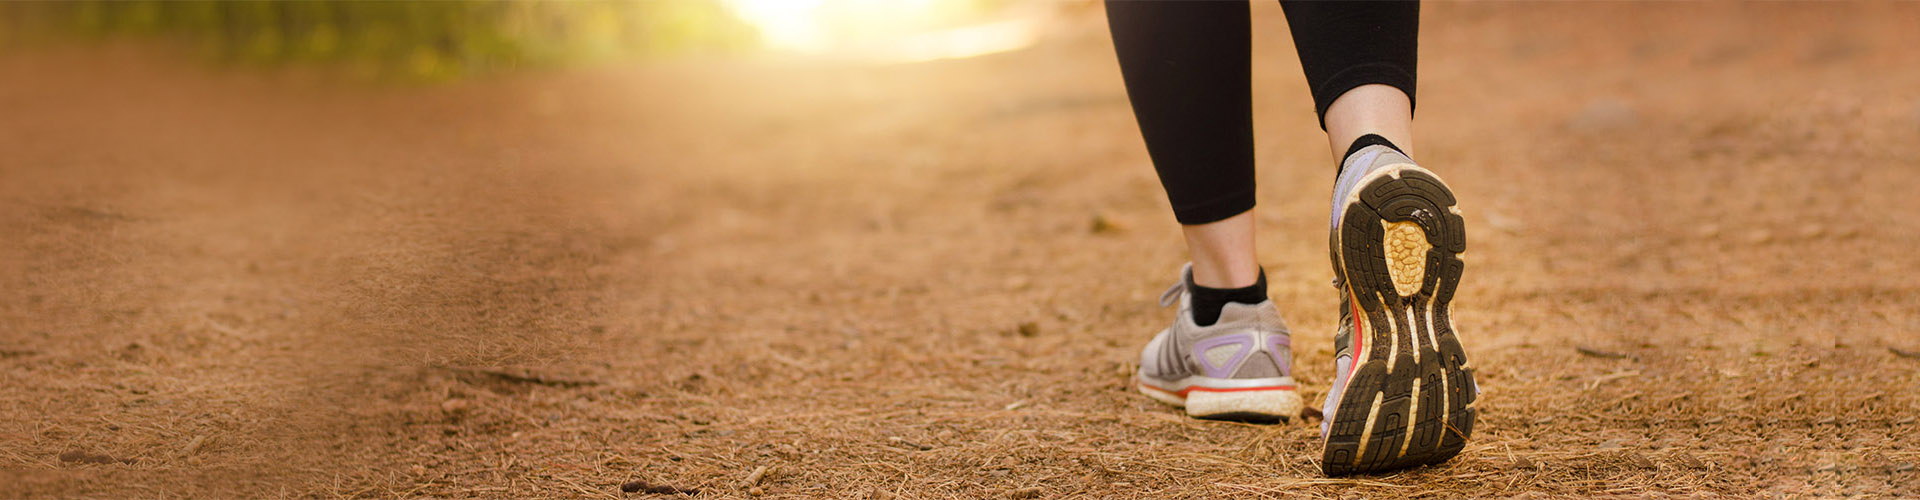 STIWELL Neurorehabilitation | information about drop foot